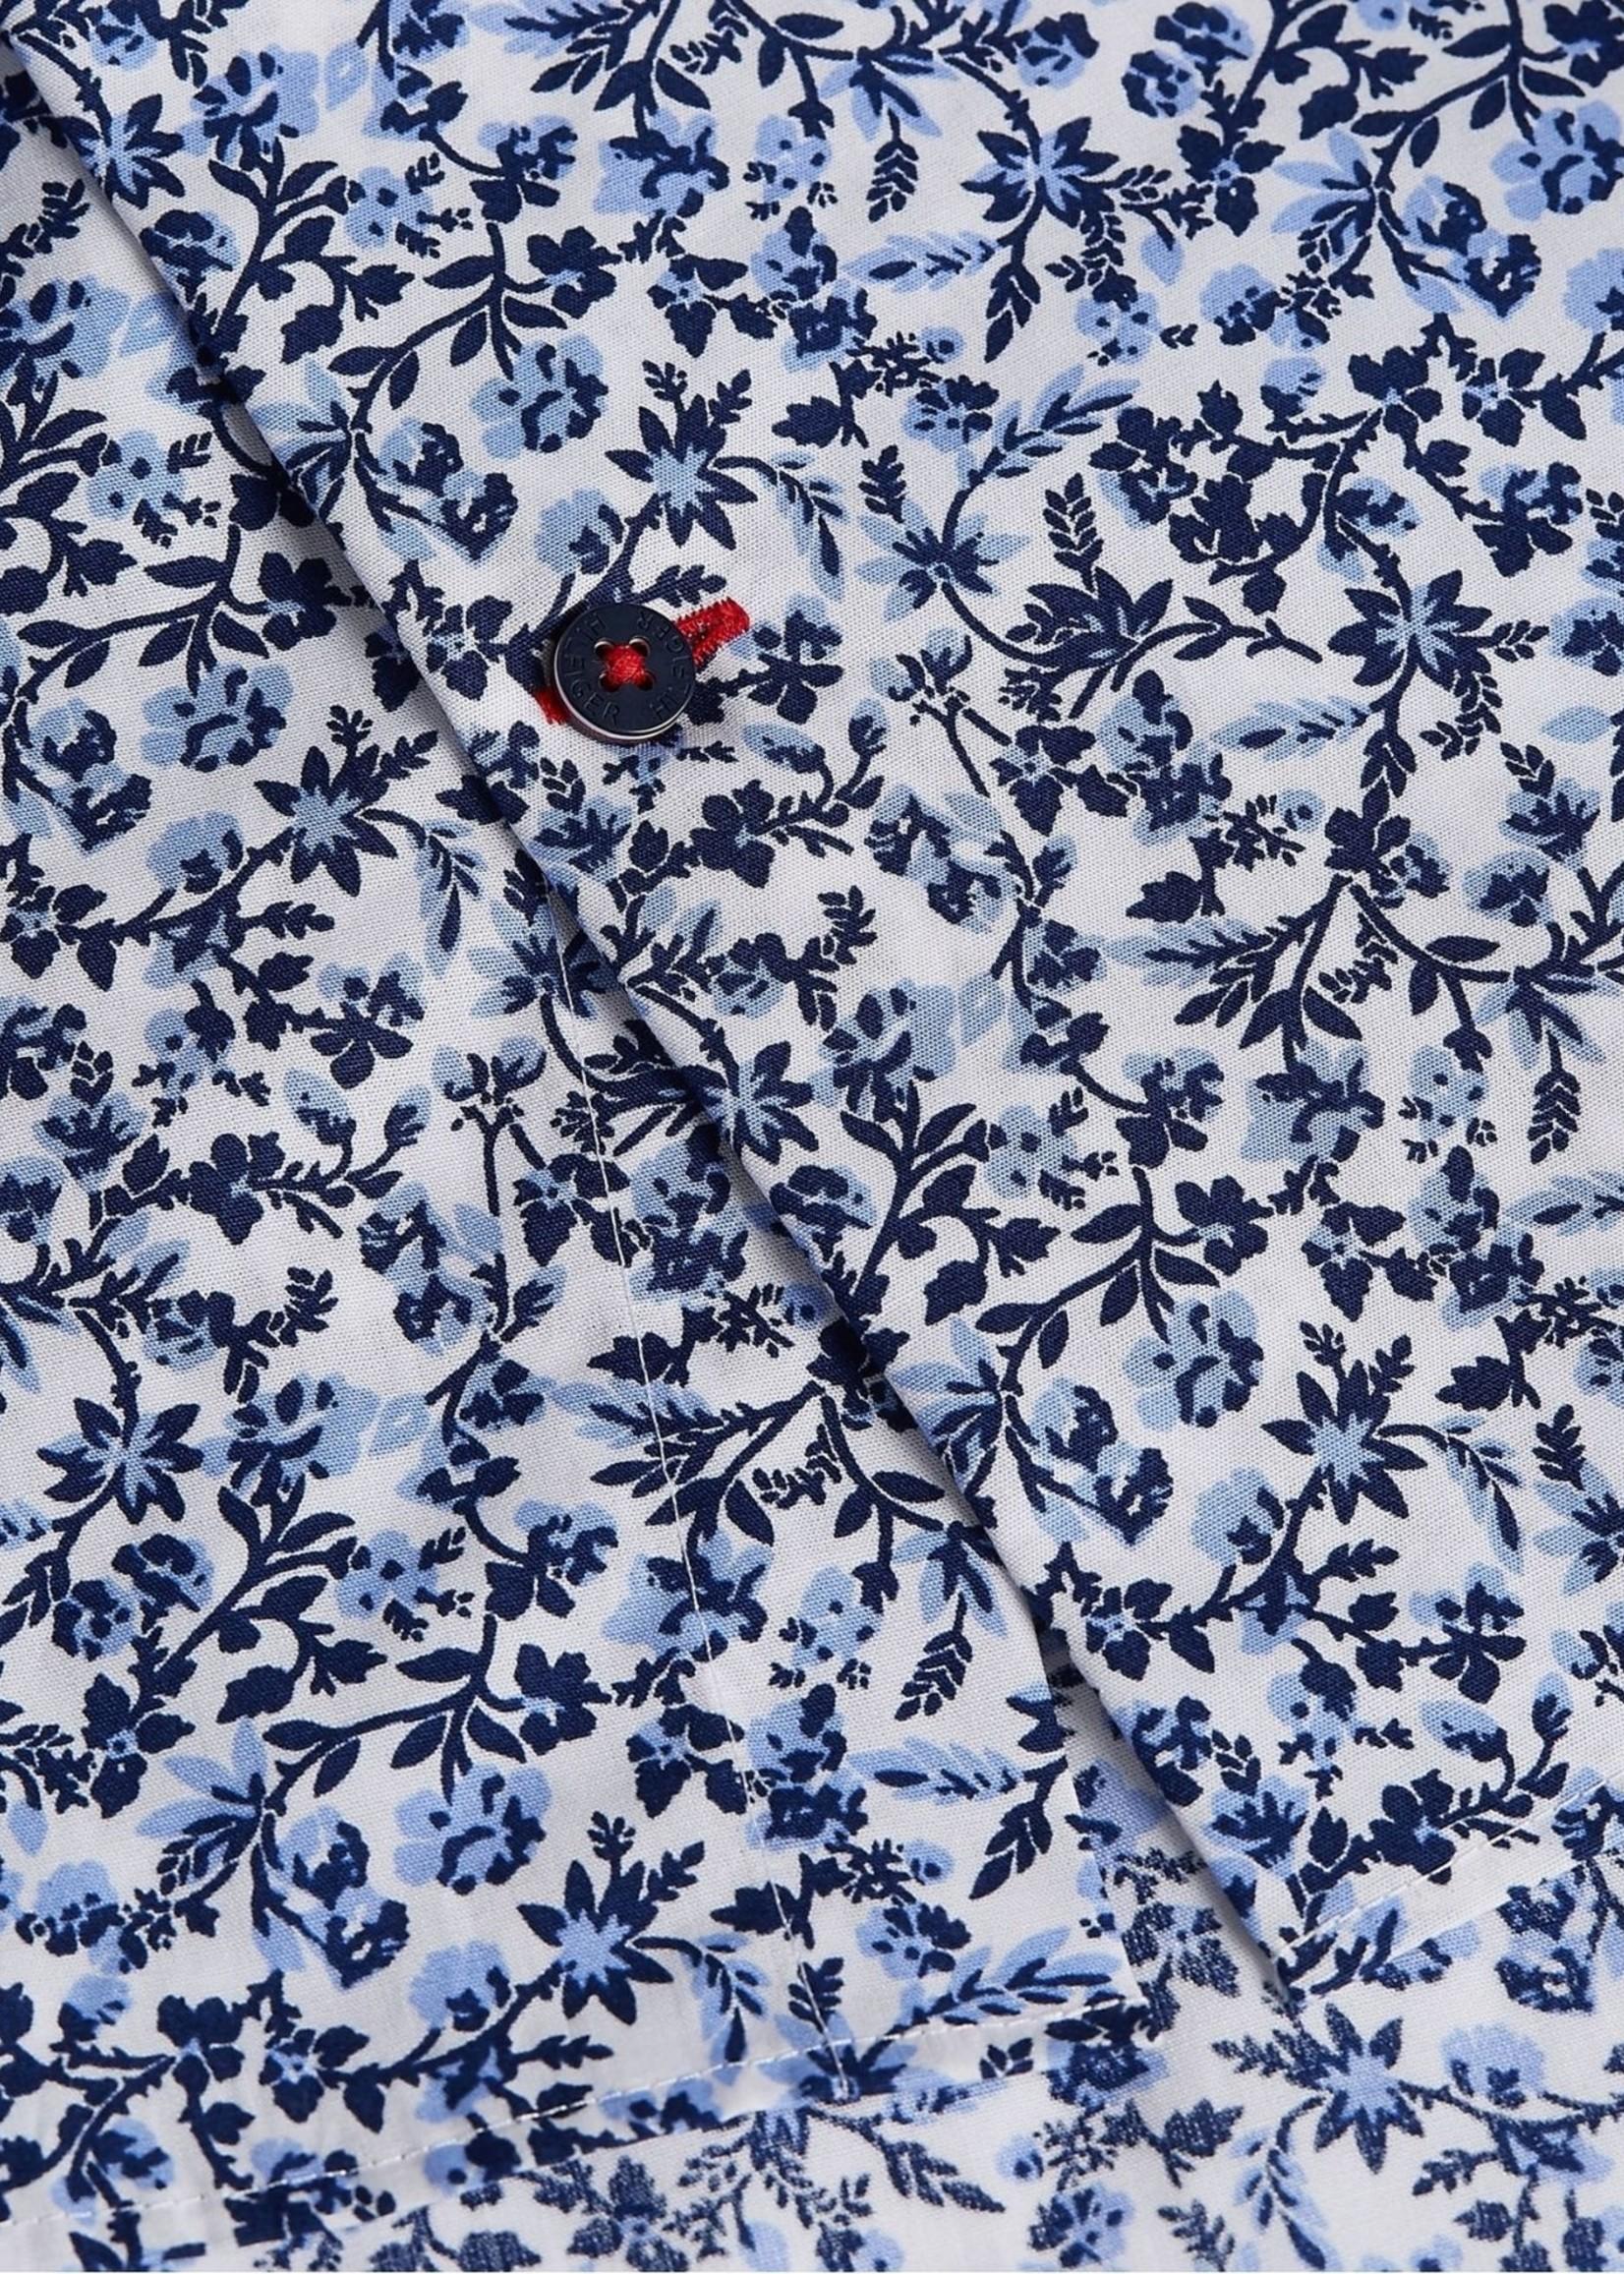 Tommy Hilfiger Large Floral Print Slim Shirt | Lichtblauw/Wit/Navy | Tommy Hilfiger